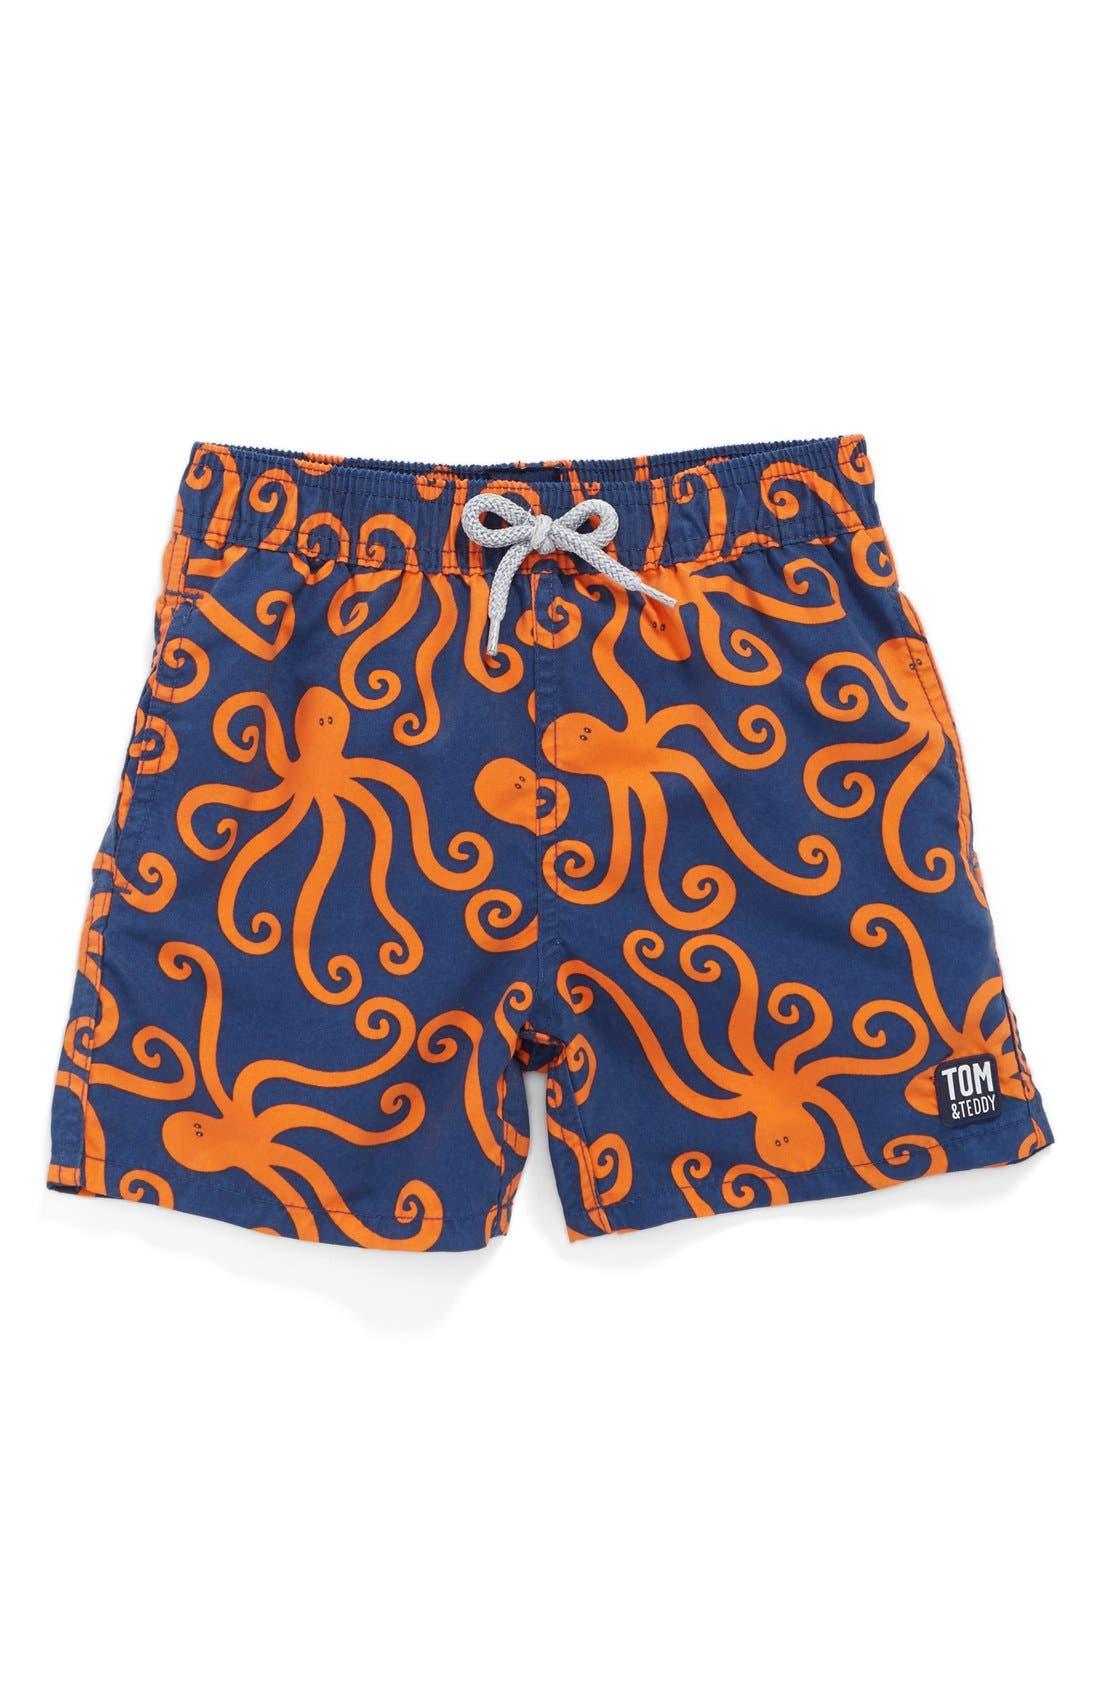 'Octopus Pattern' Swim Trunks,                         Main,                         color, Blue Orange